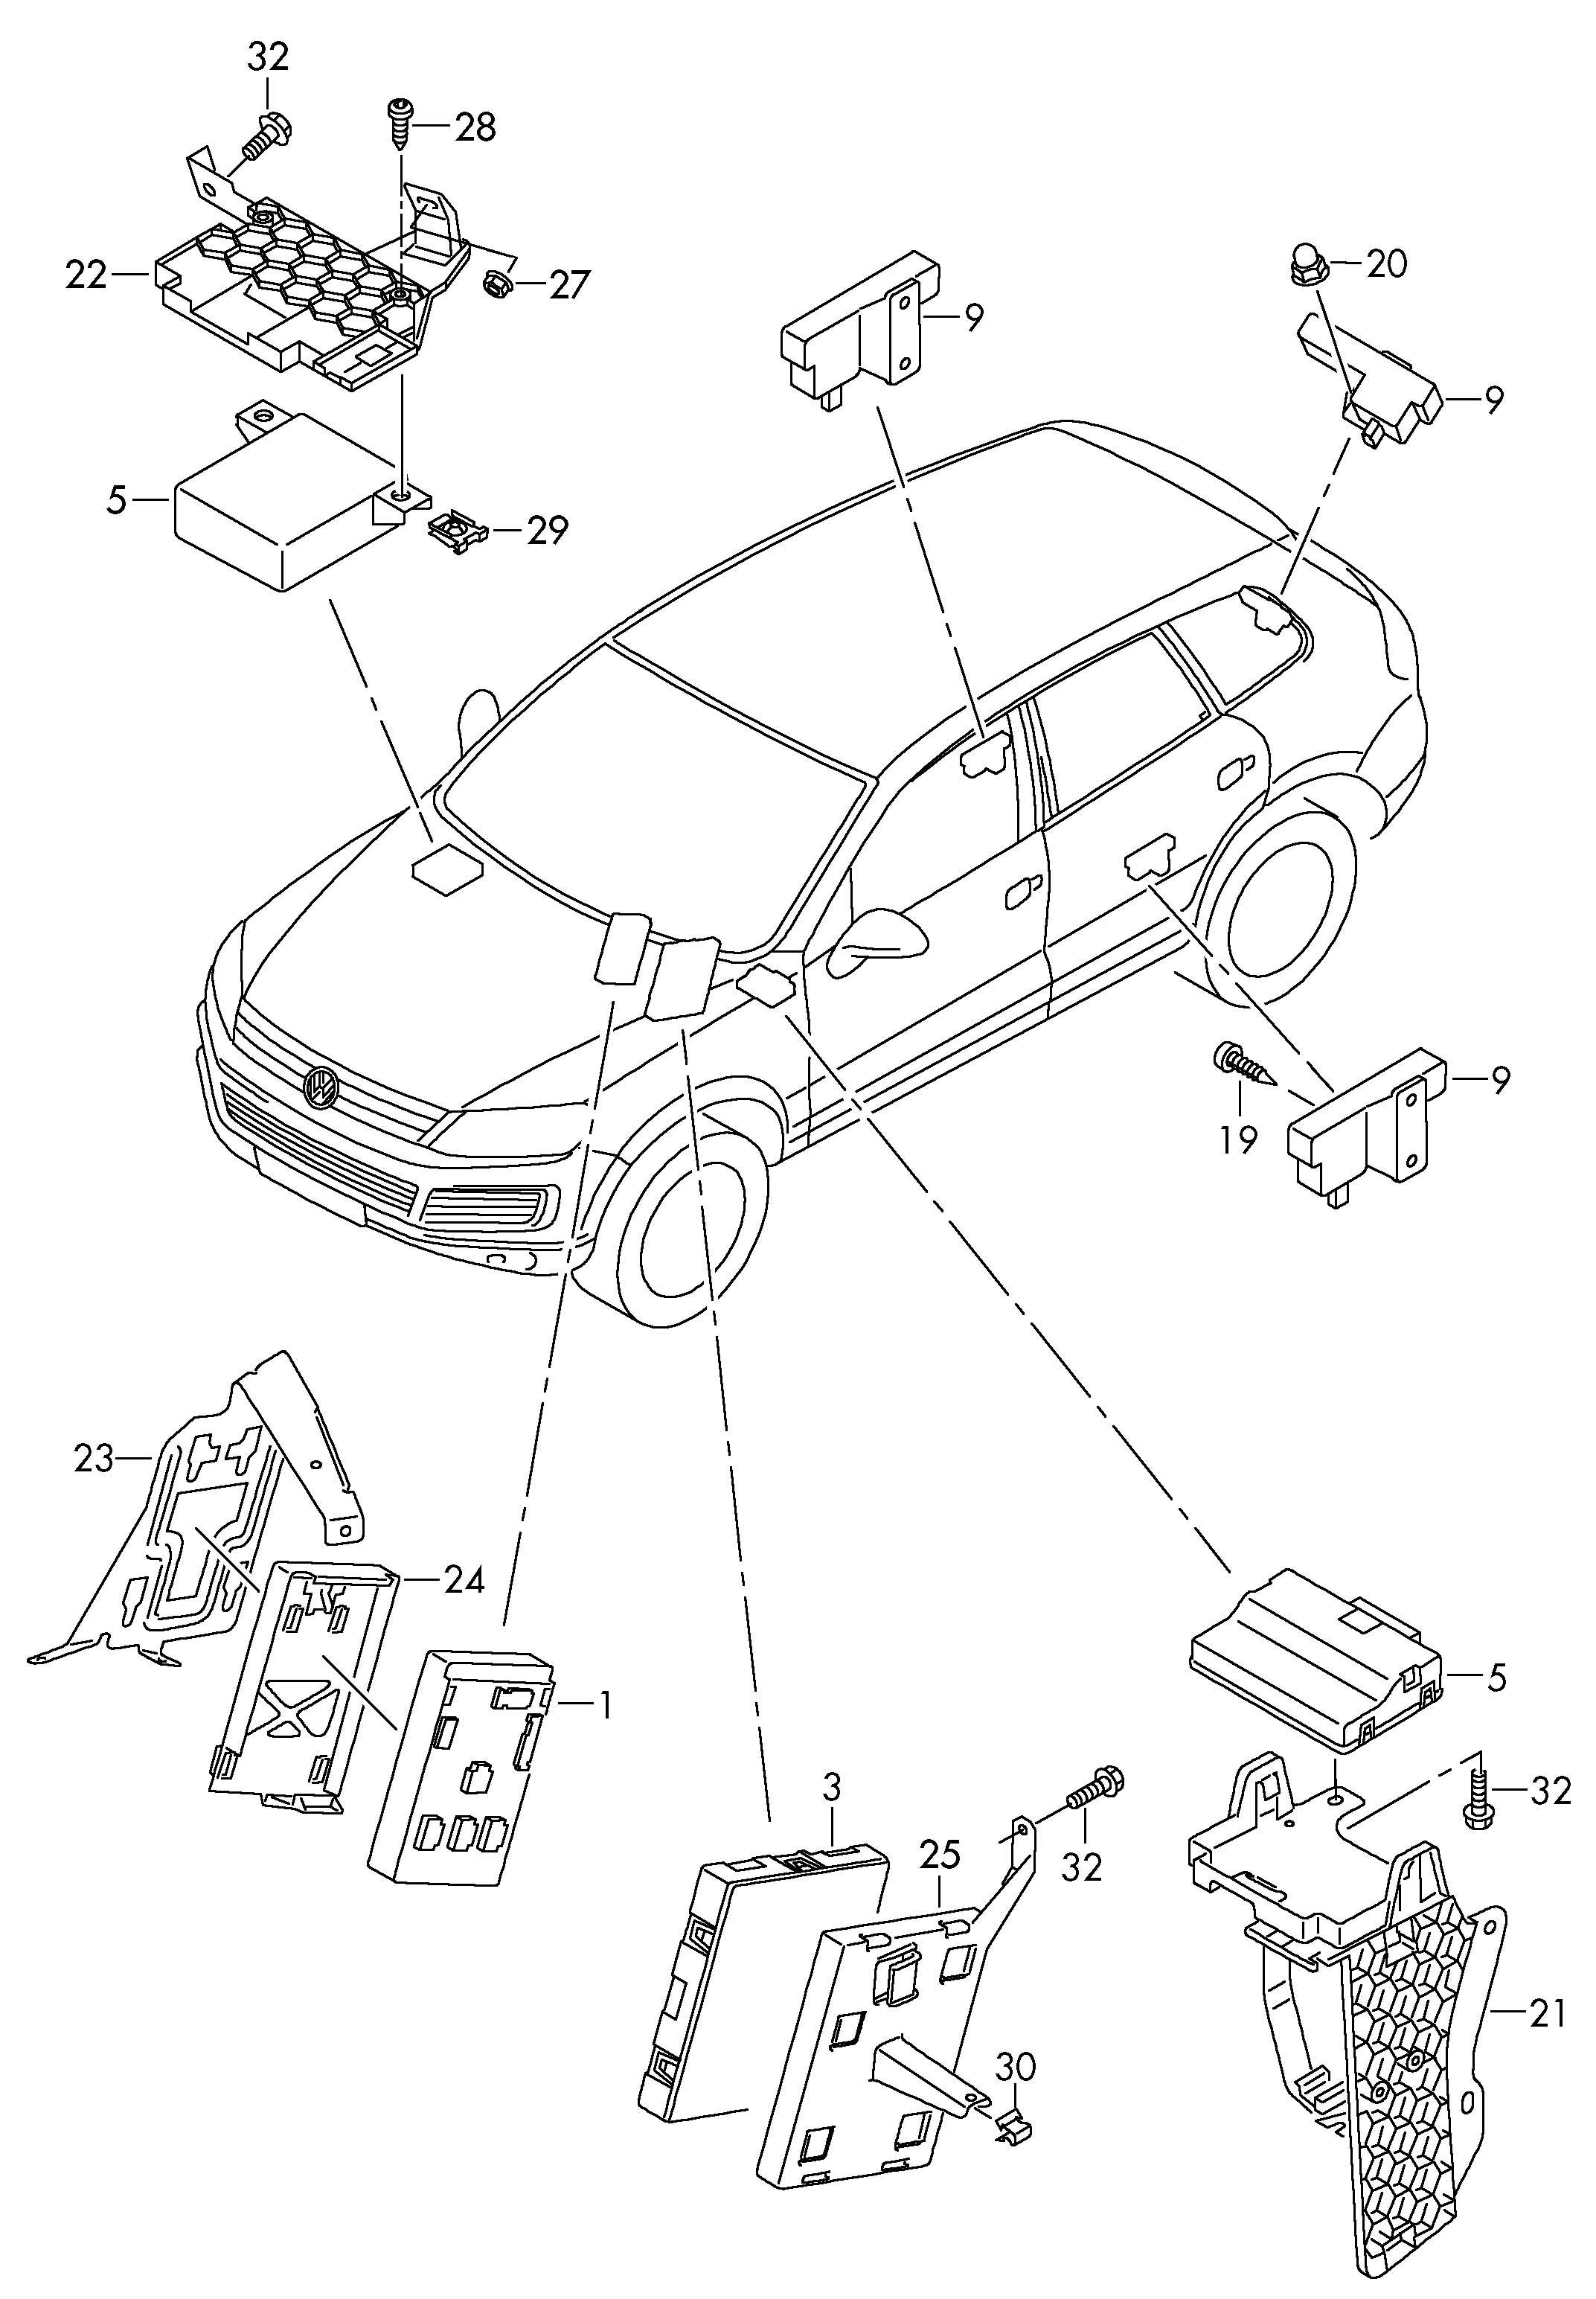 Volkswagen Touareg Diagnosis Interface For Data Bus